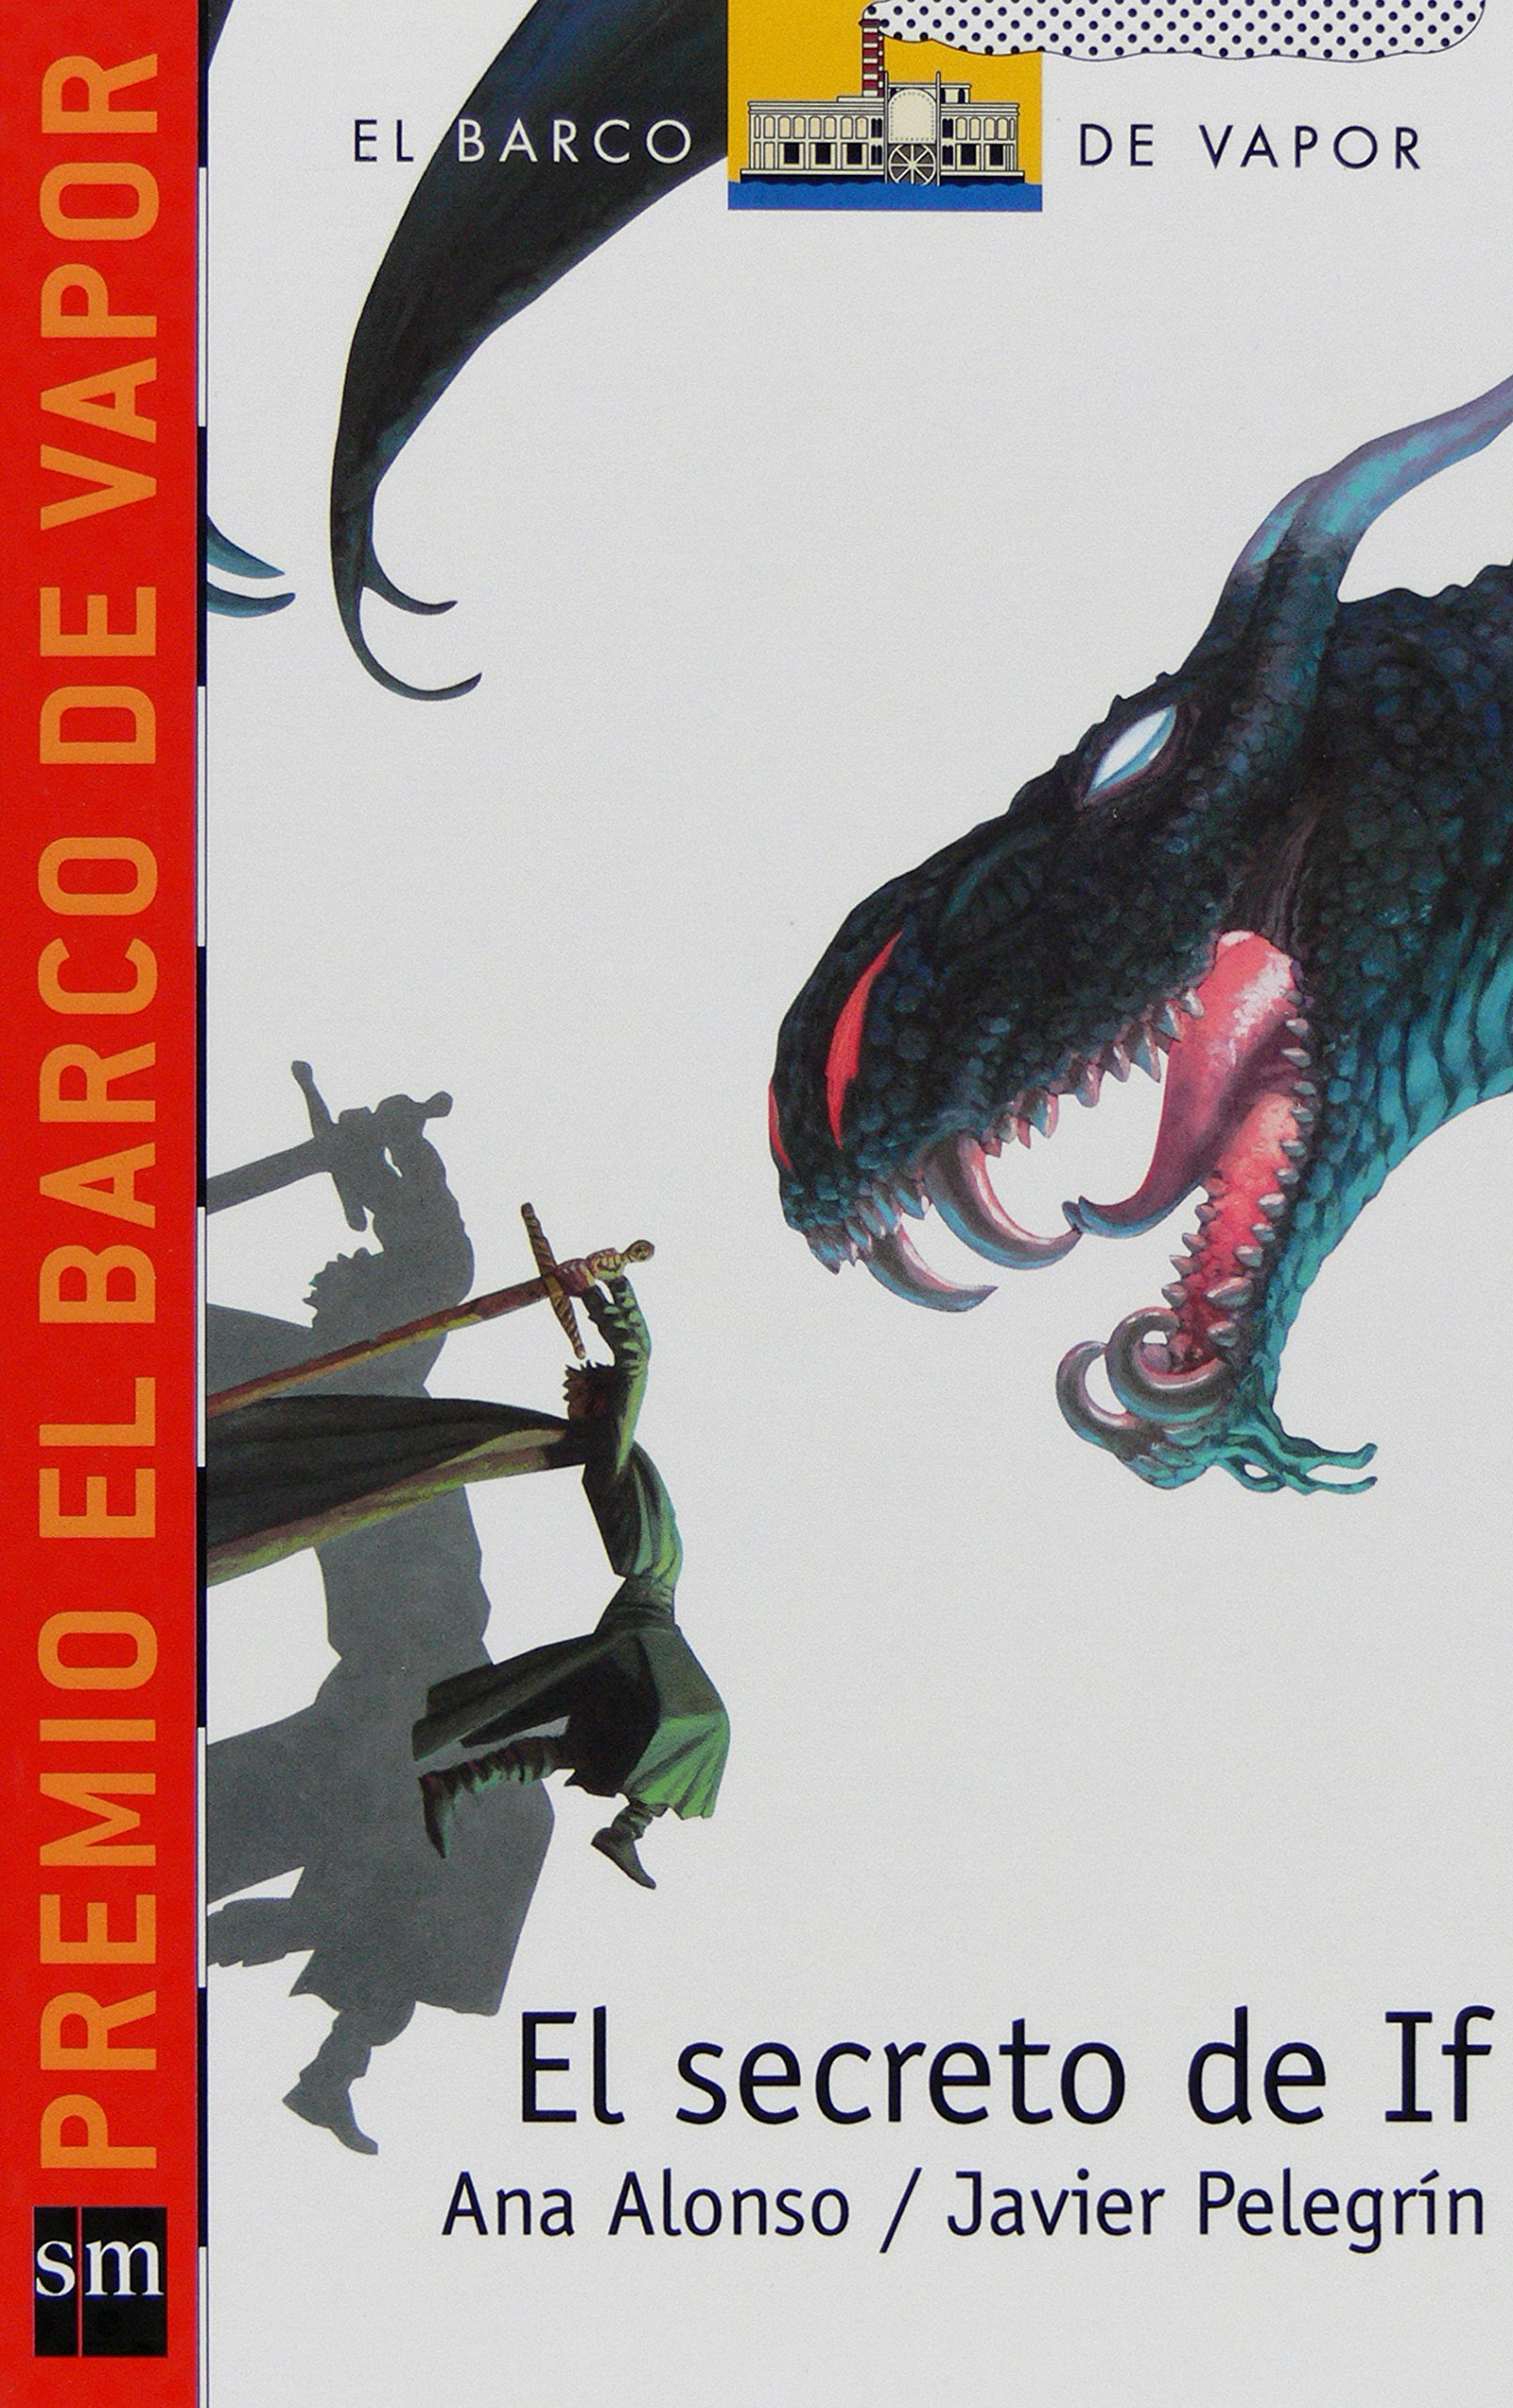 El secreto de If (Rústica) (Barco de Vapor Roja): Amazon.es: Ana Alonso, Javier Pelegrín, Marcelo Pérez de Muti: Libros